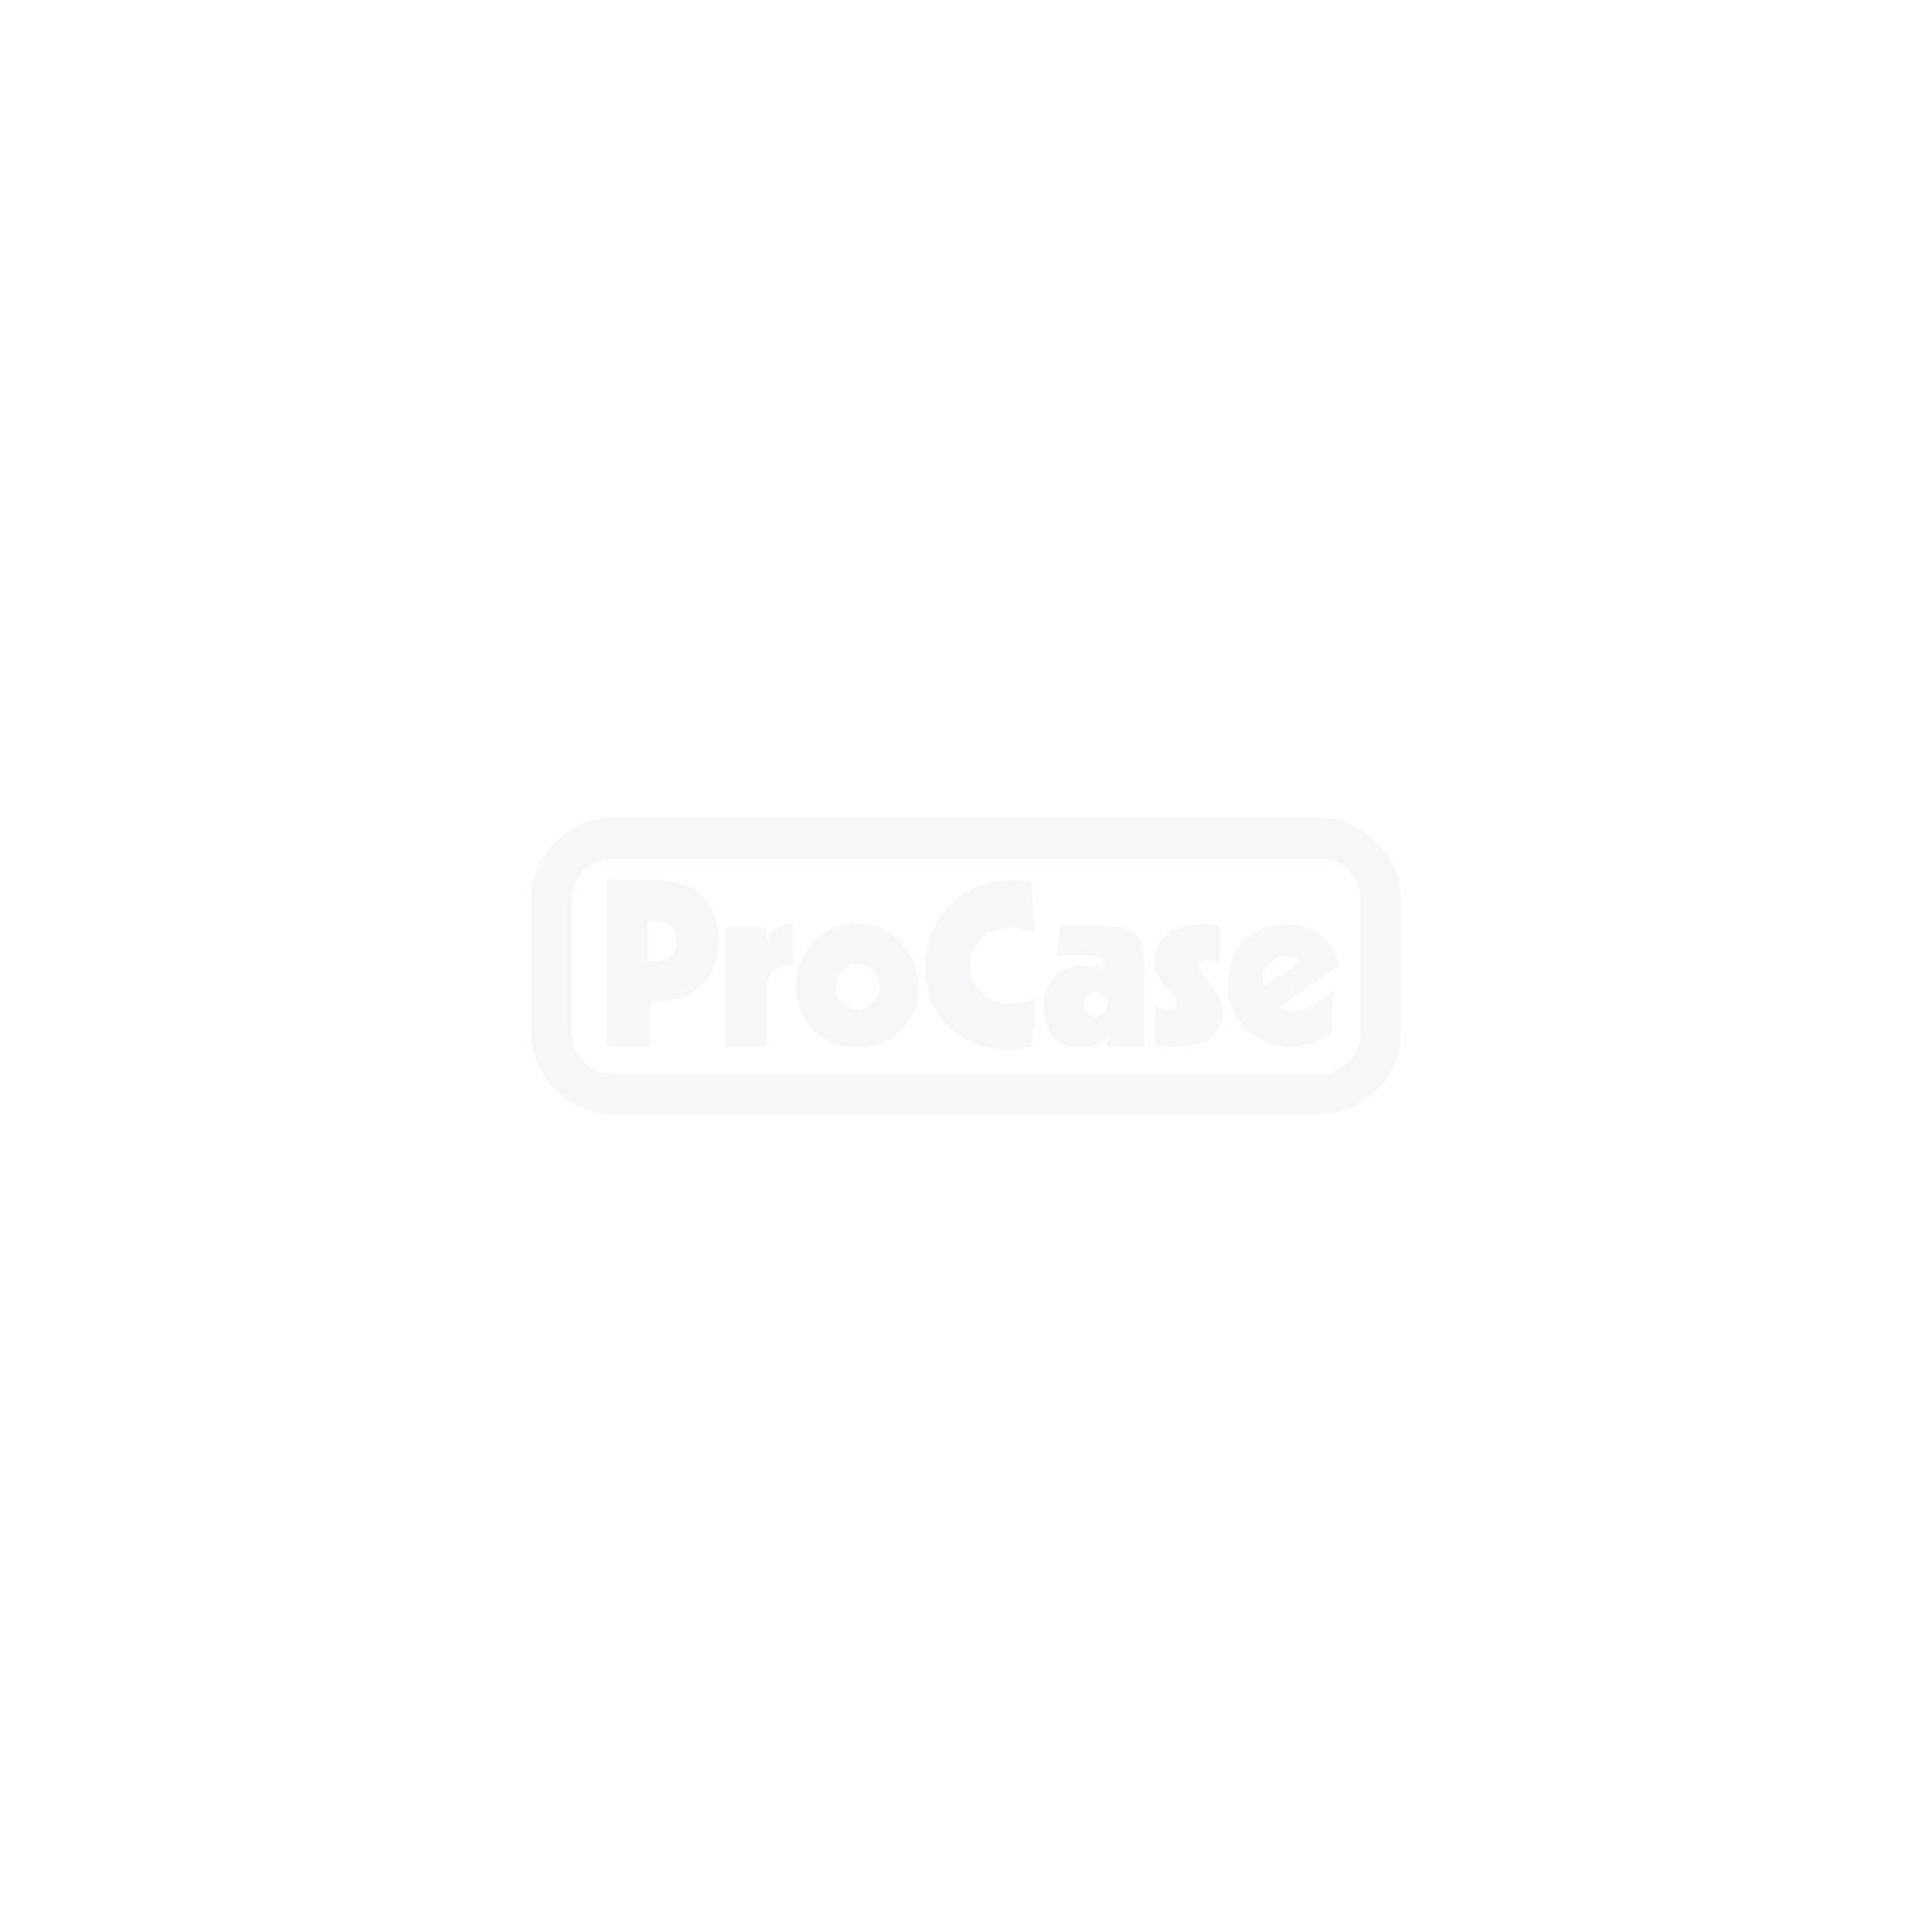 Transportbox variabel für Ultraschallgerät 2